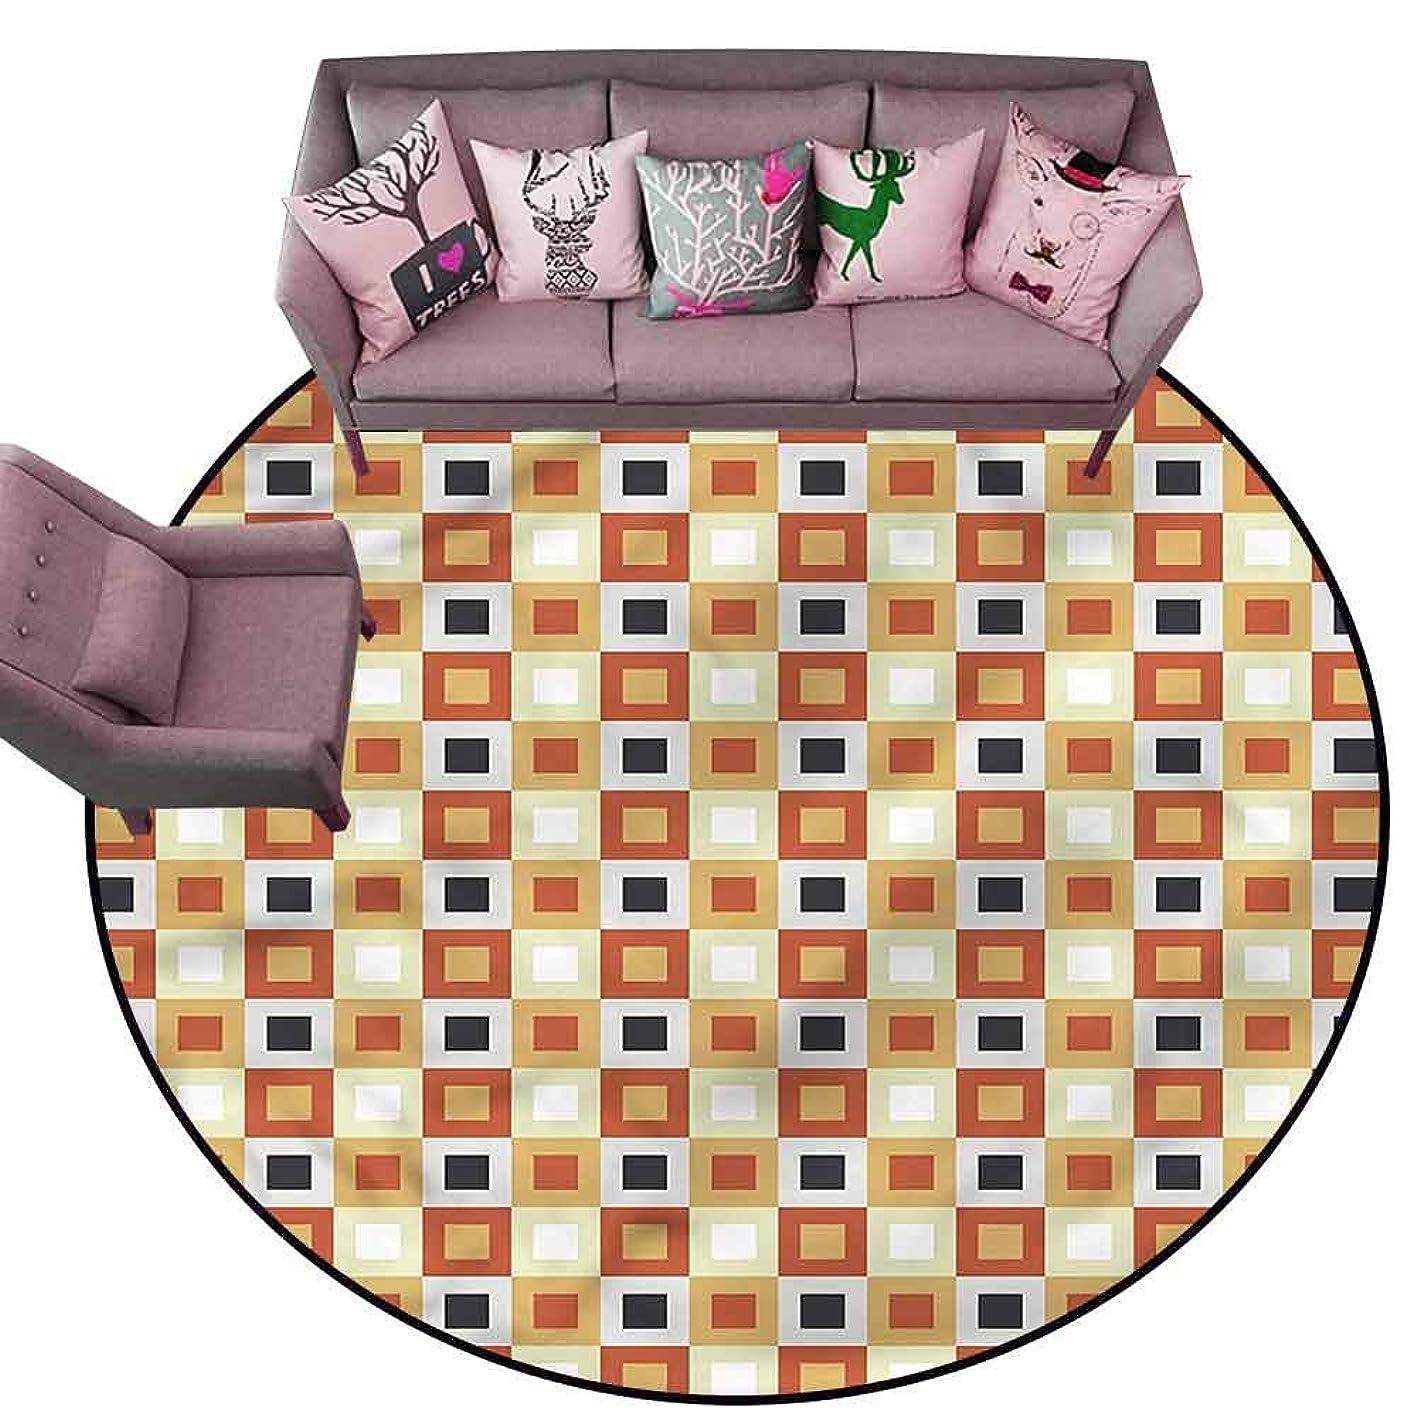 Designed Kitchen Bathroom Floor Mat Colorful Vintage Home,Retro Style Squares Diameter 66